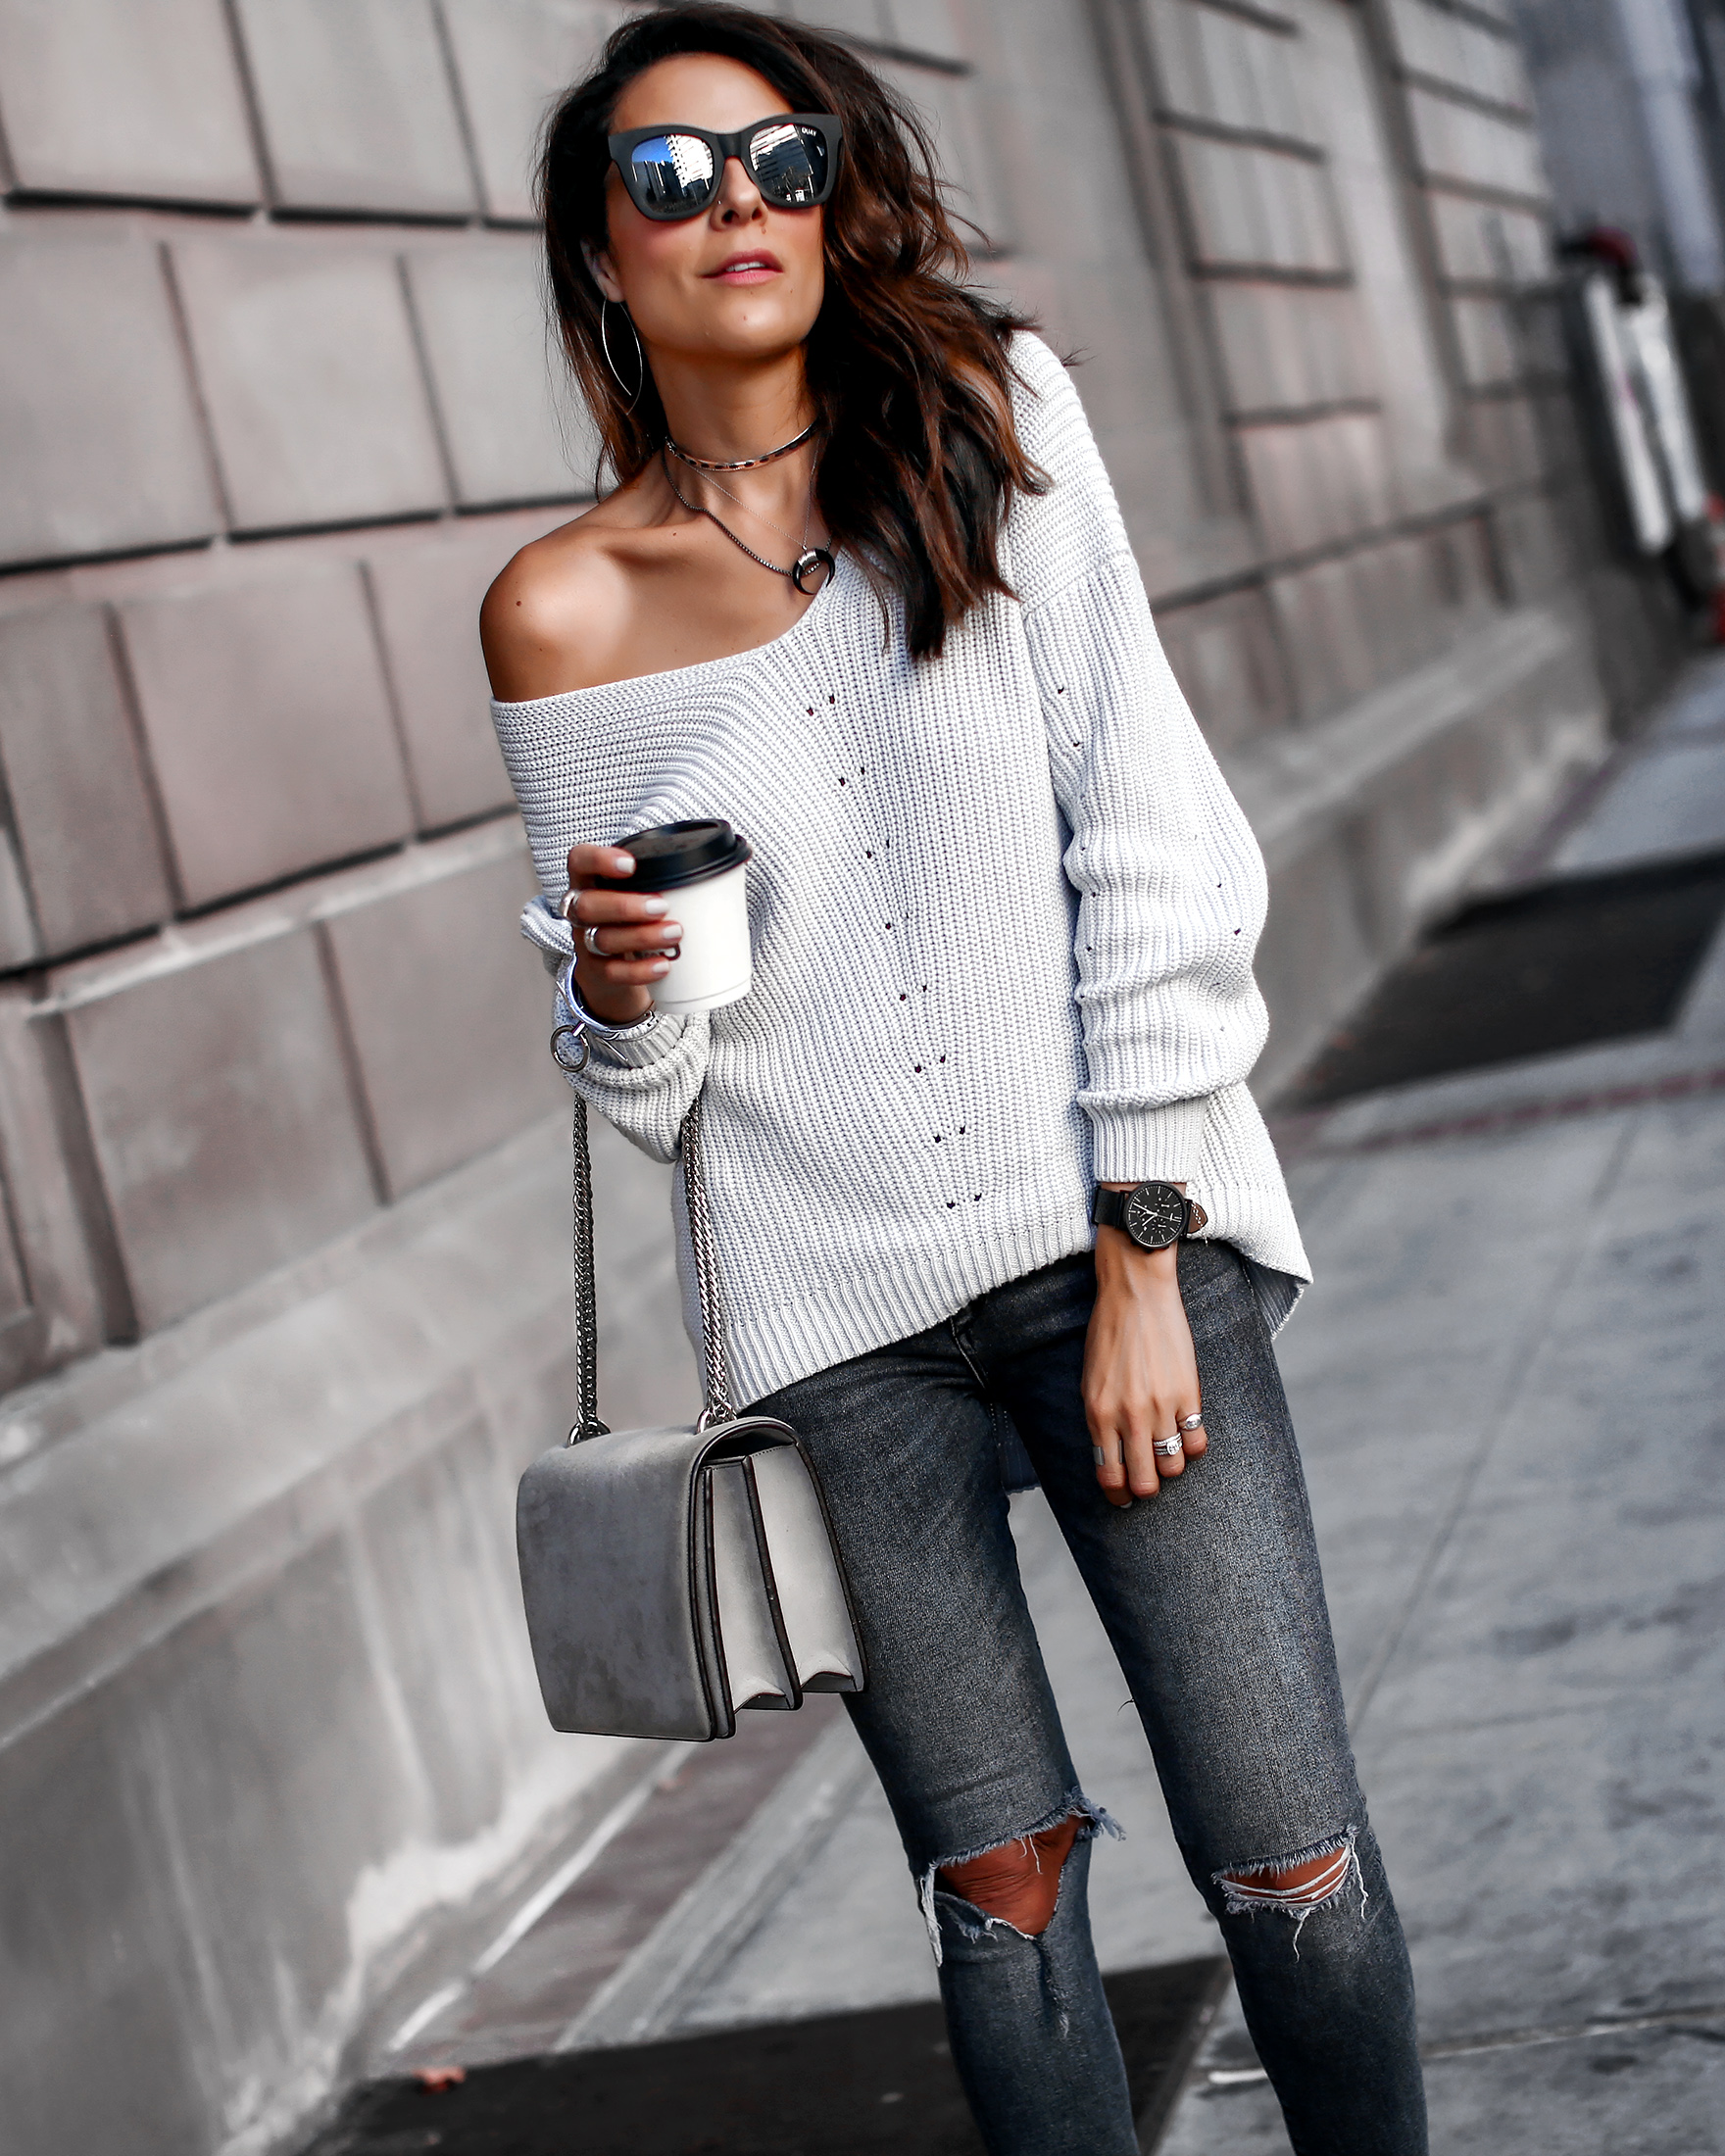 Lucys Whims Brunnette Woman Wearing Off the Shoulder 525 Sweater DL1961 Ripped Jeans Agneel Shoulder Bag.jpg